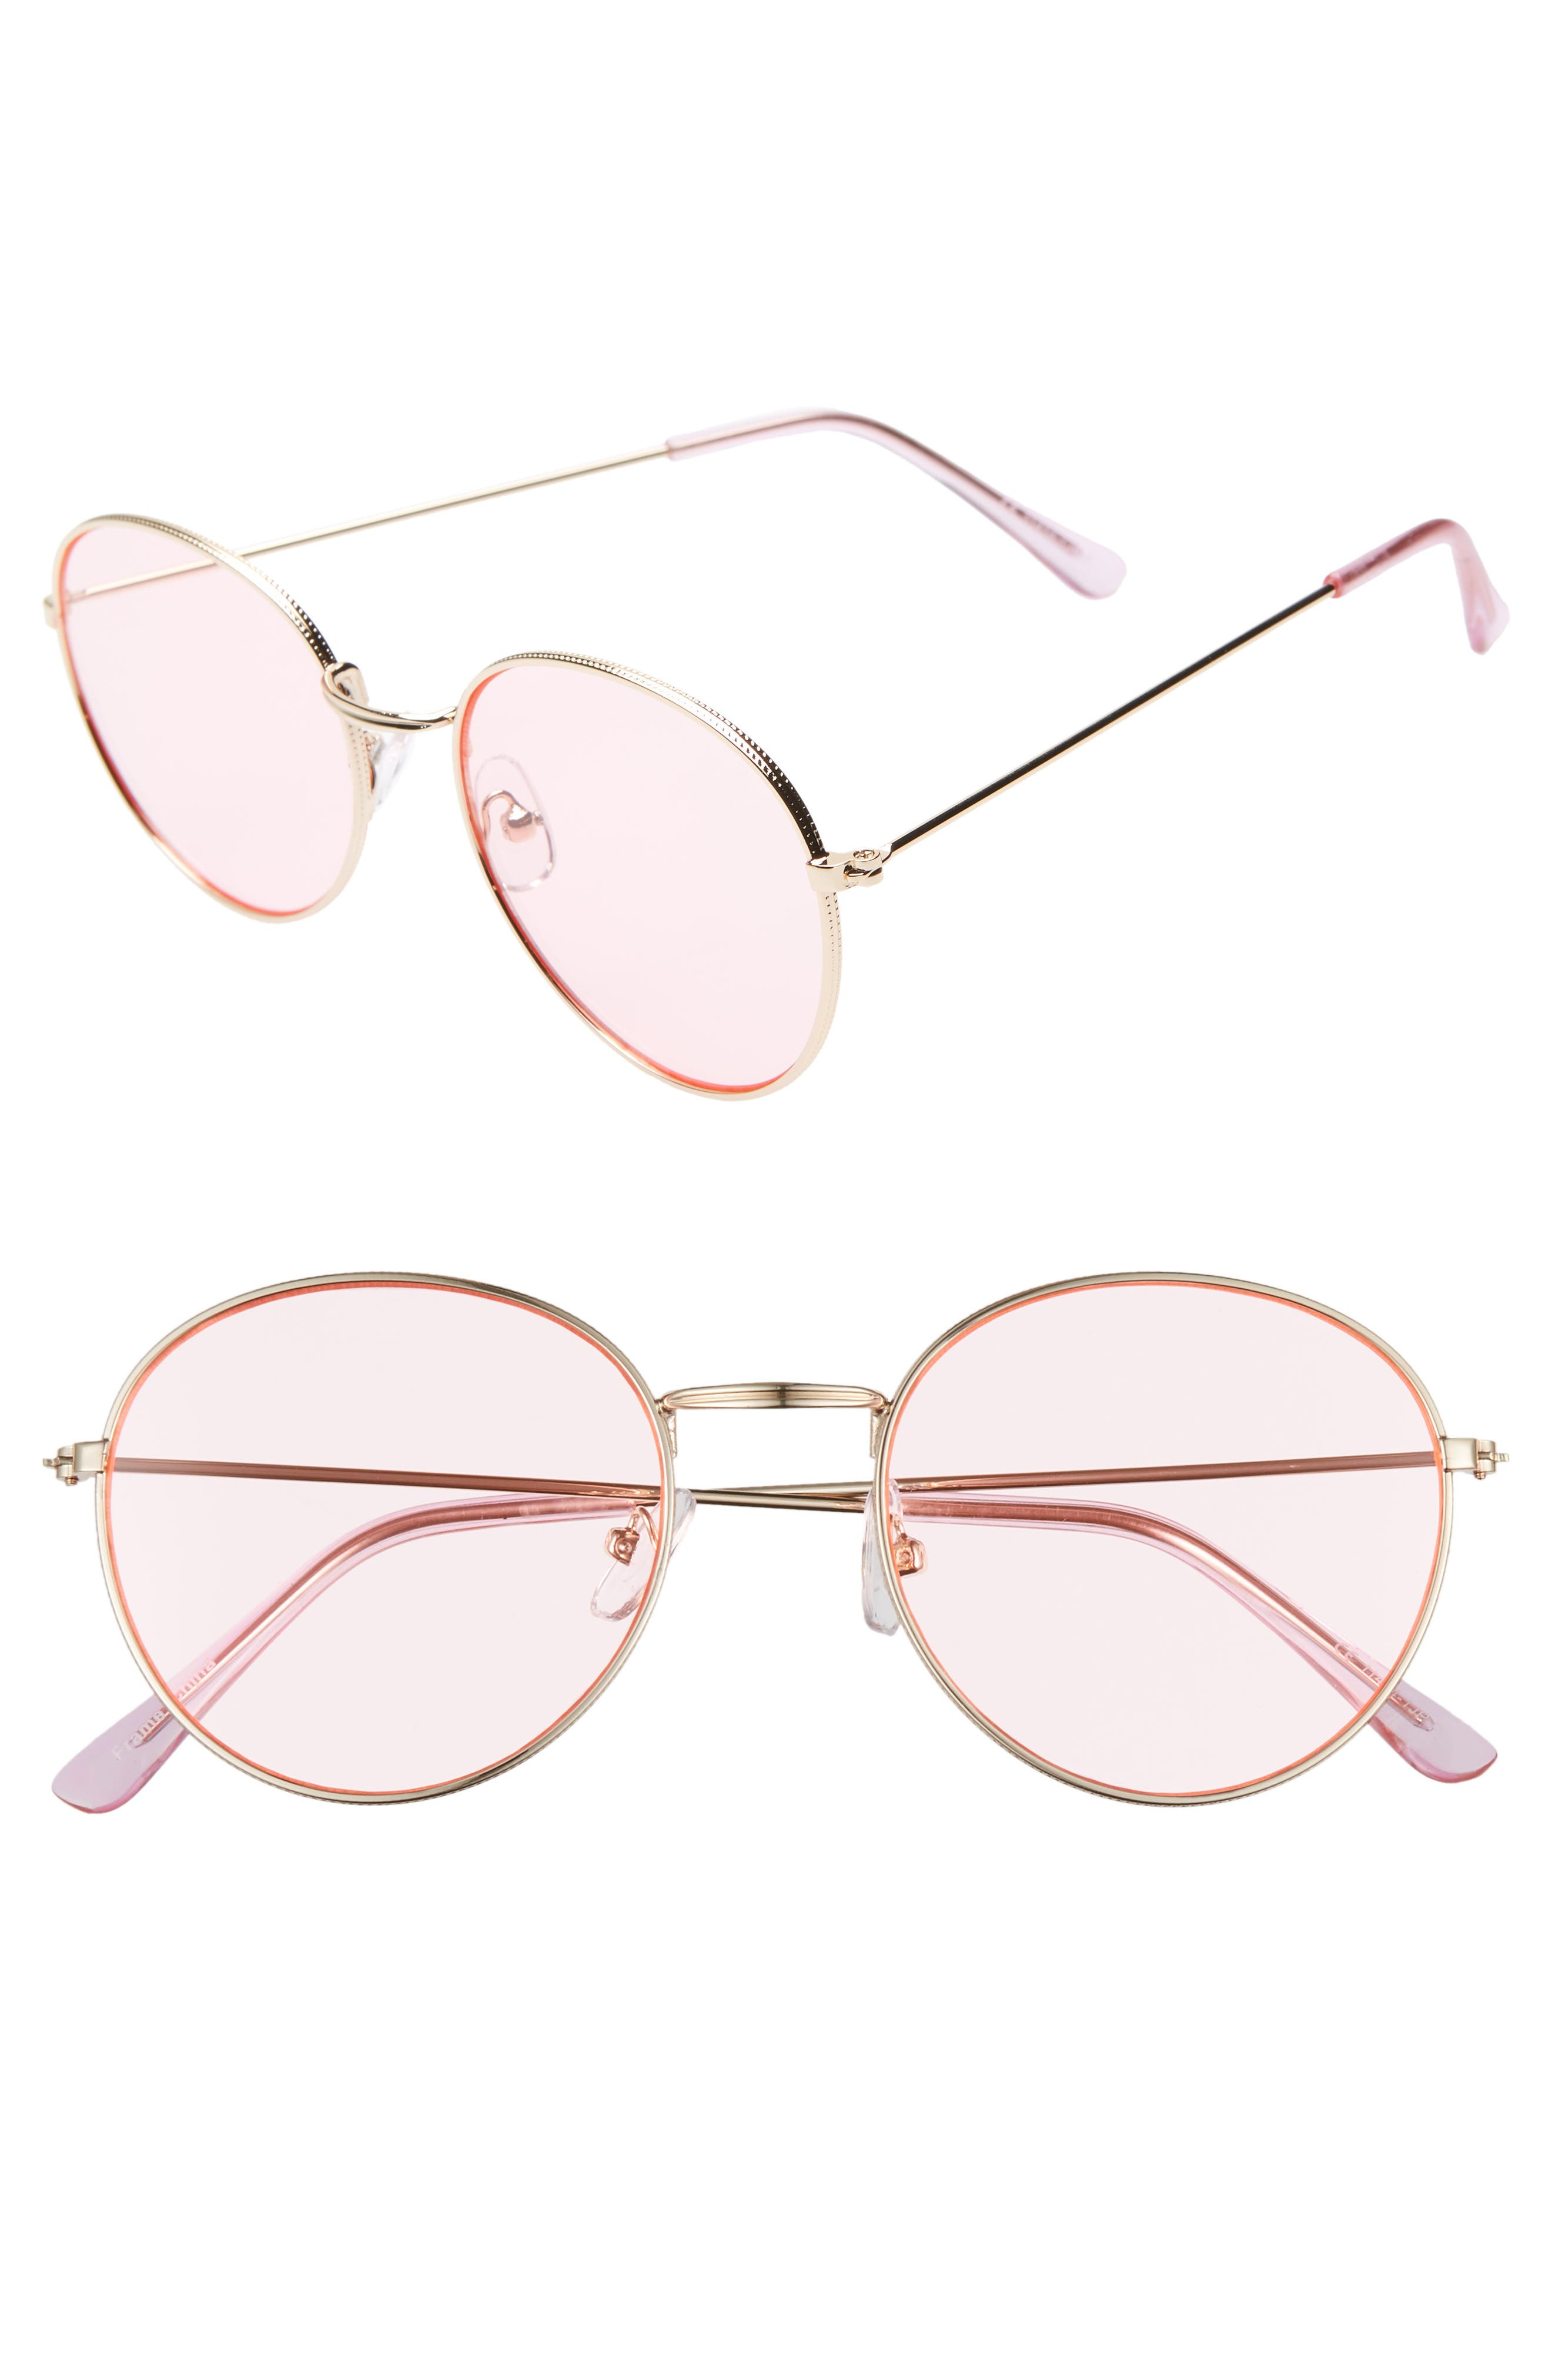 GLANCE EYEWEAR,                             50mm Thin Metal Round Sunglasses,                             Main thumbnail 1, color,                             GOLD/ PINK